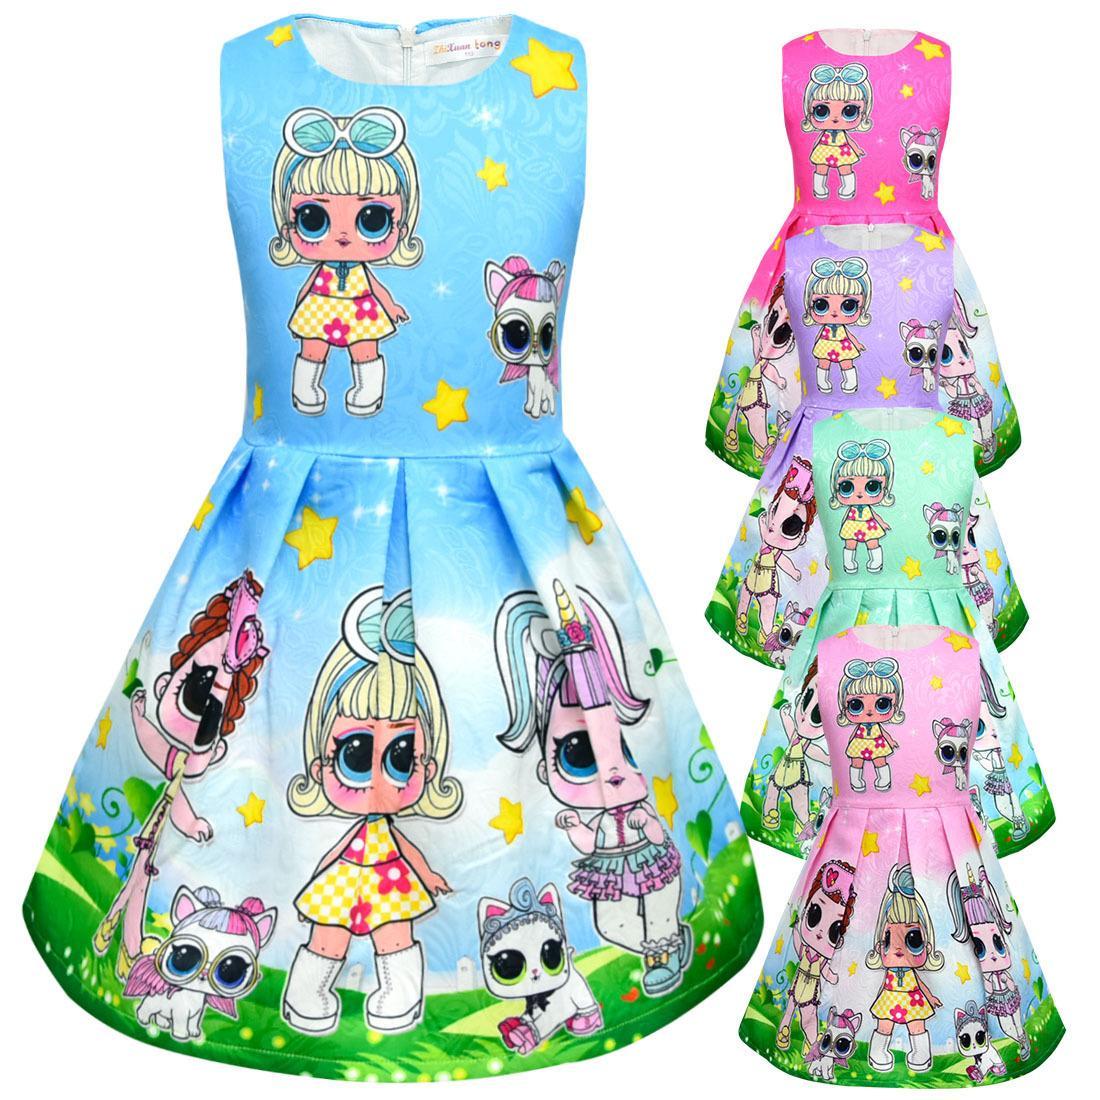 2019 new styles lol surprise creative kids dress dolls pattern girl dresses high-end jacquard skirt wholesale